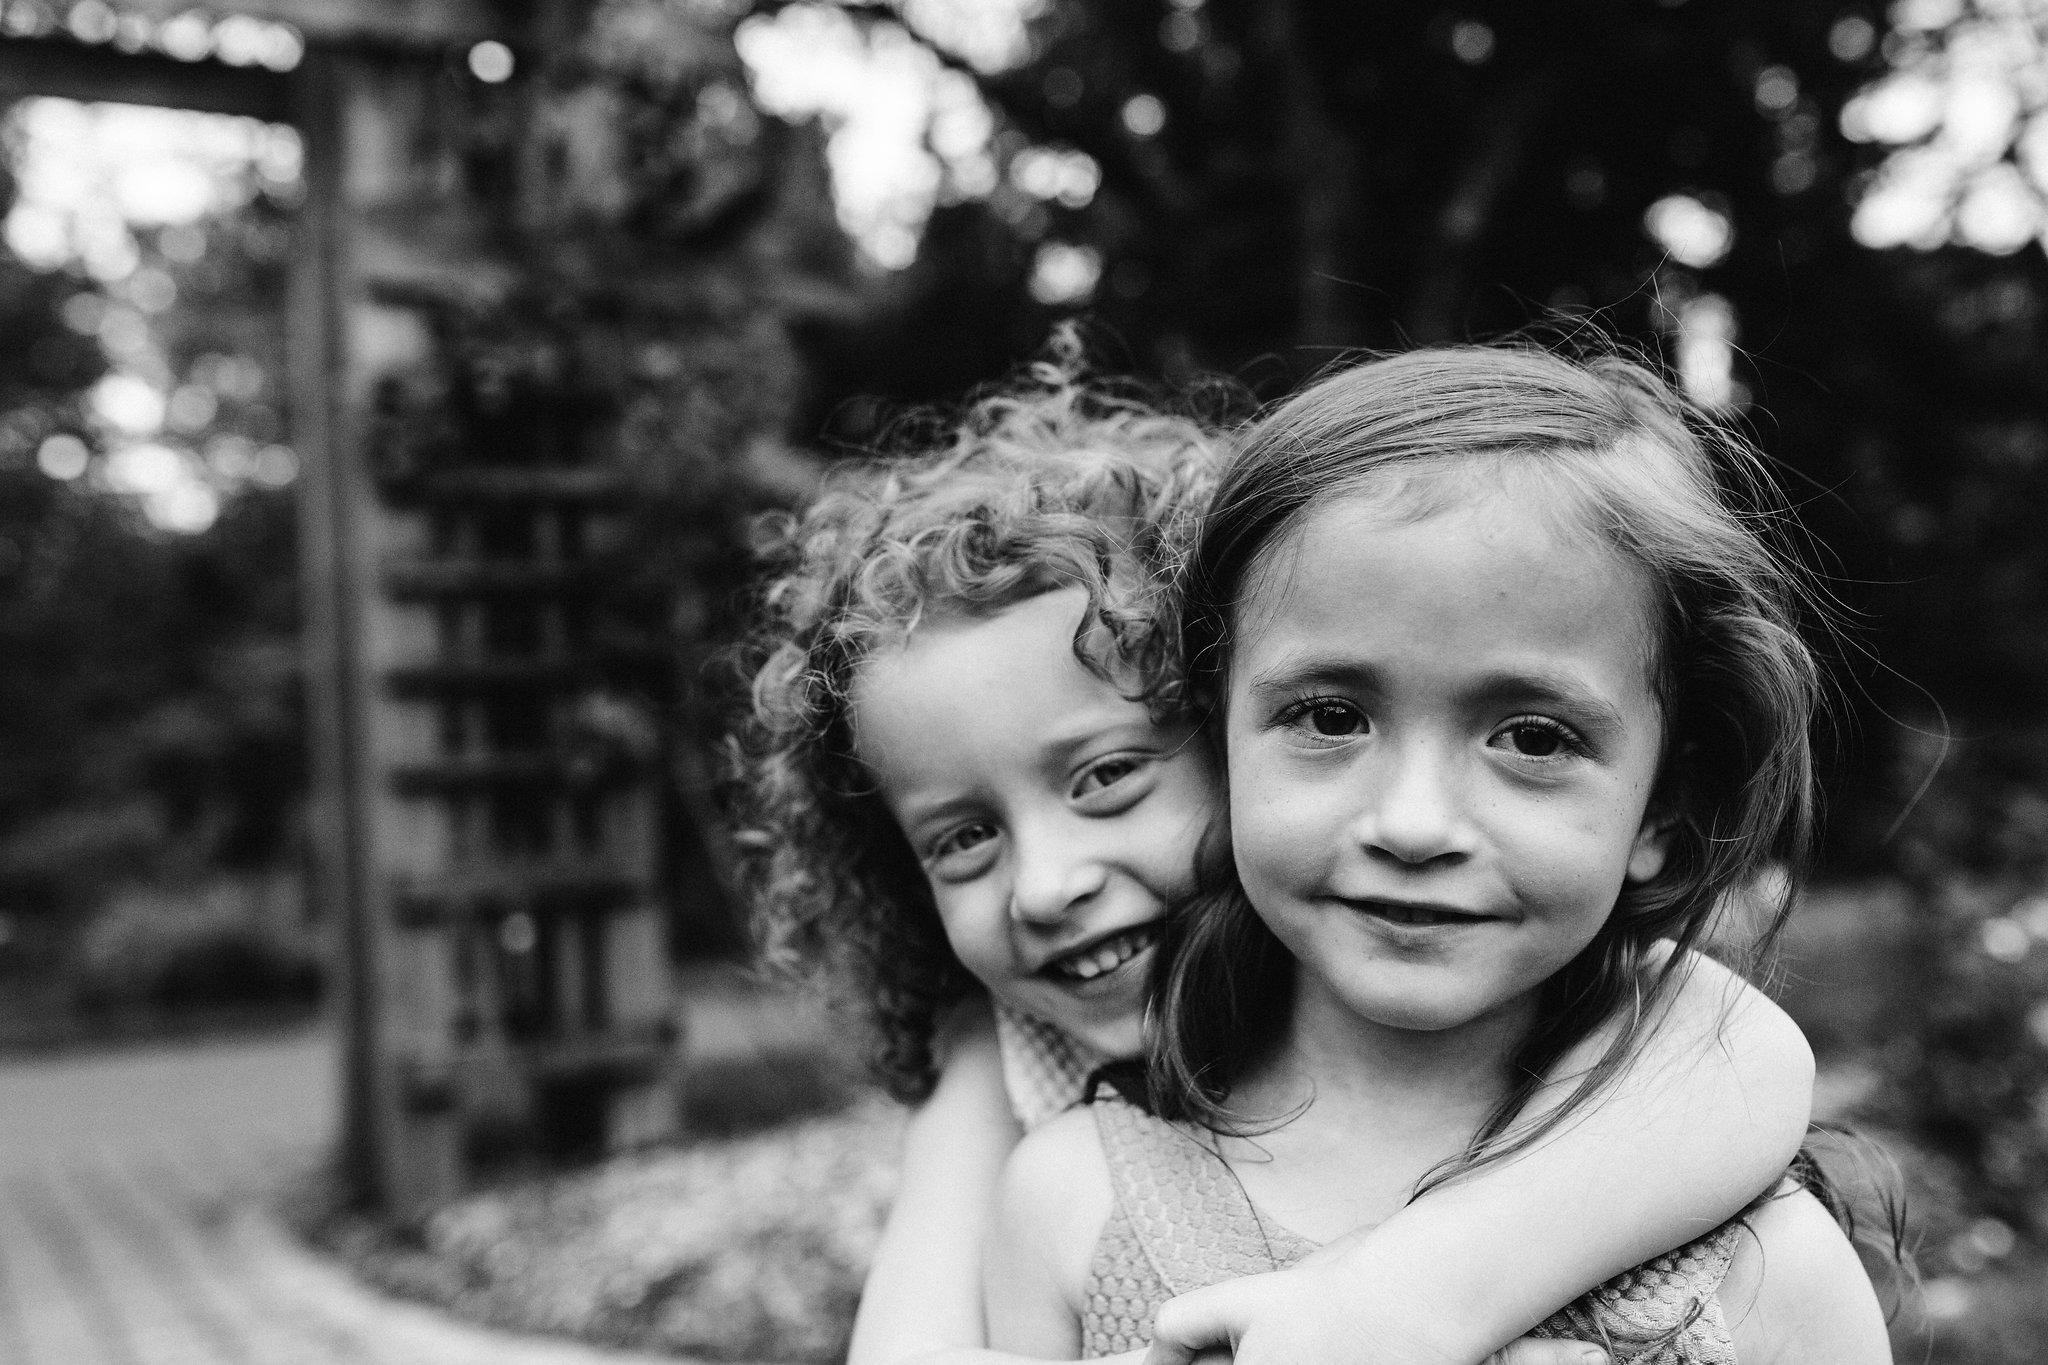 ella&janie-042.jpg